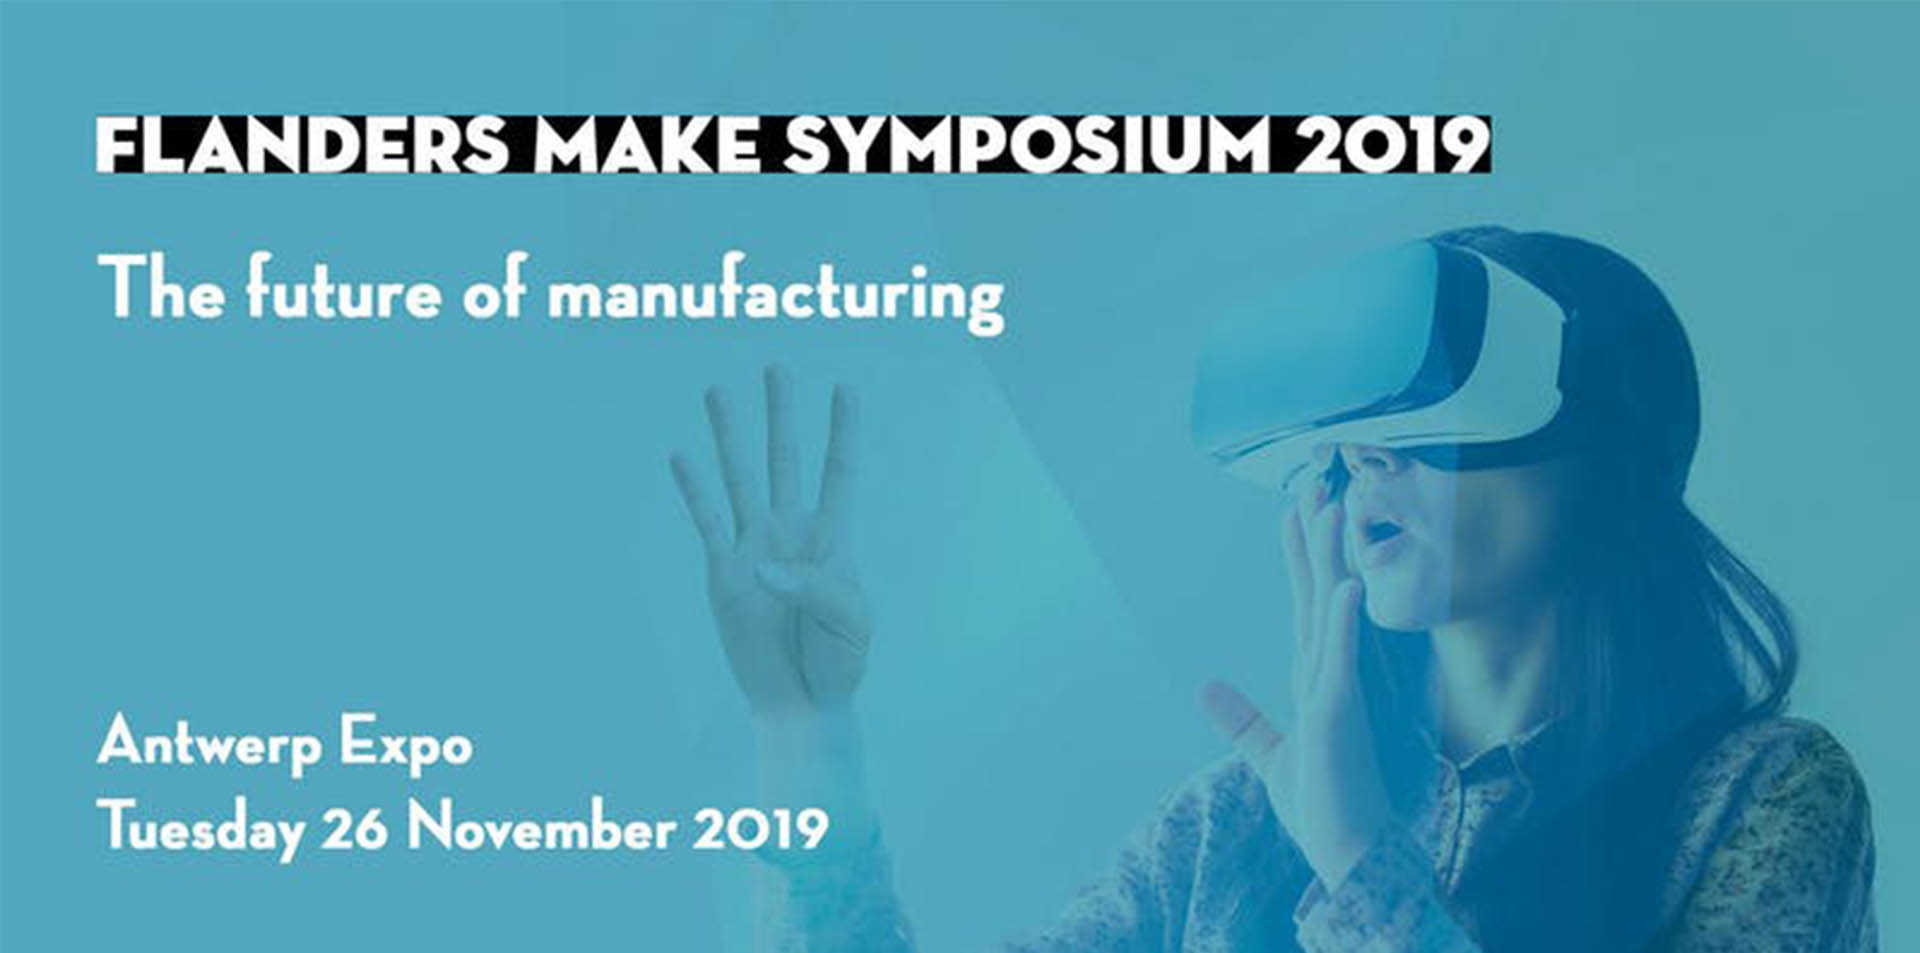 Flanders Make Symposium